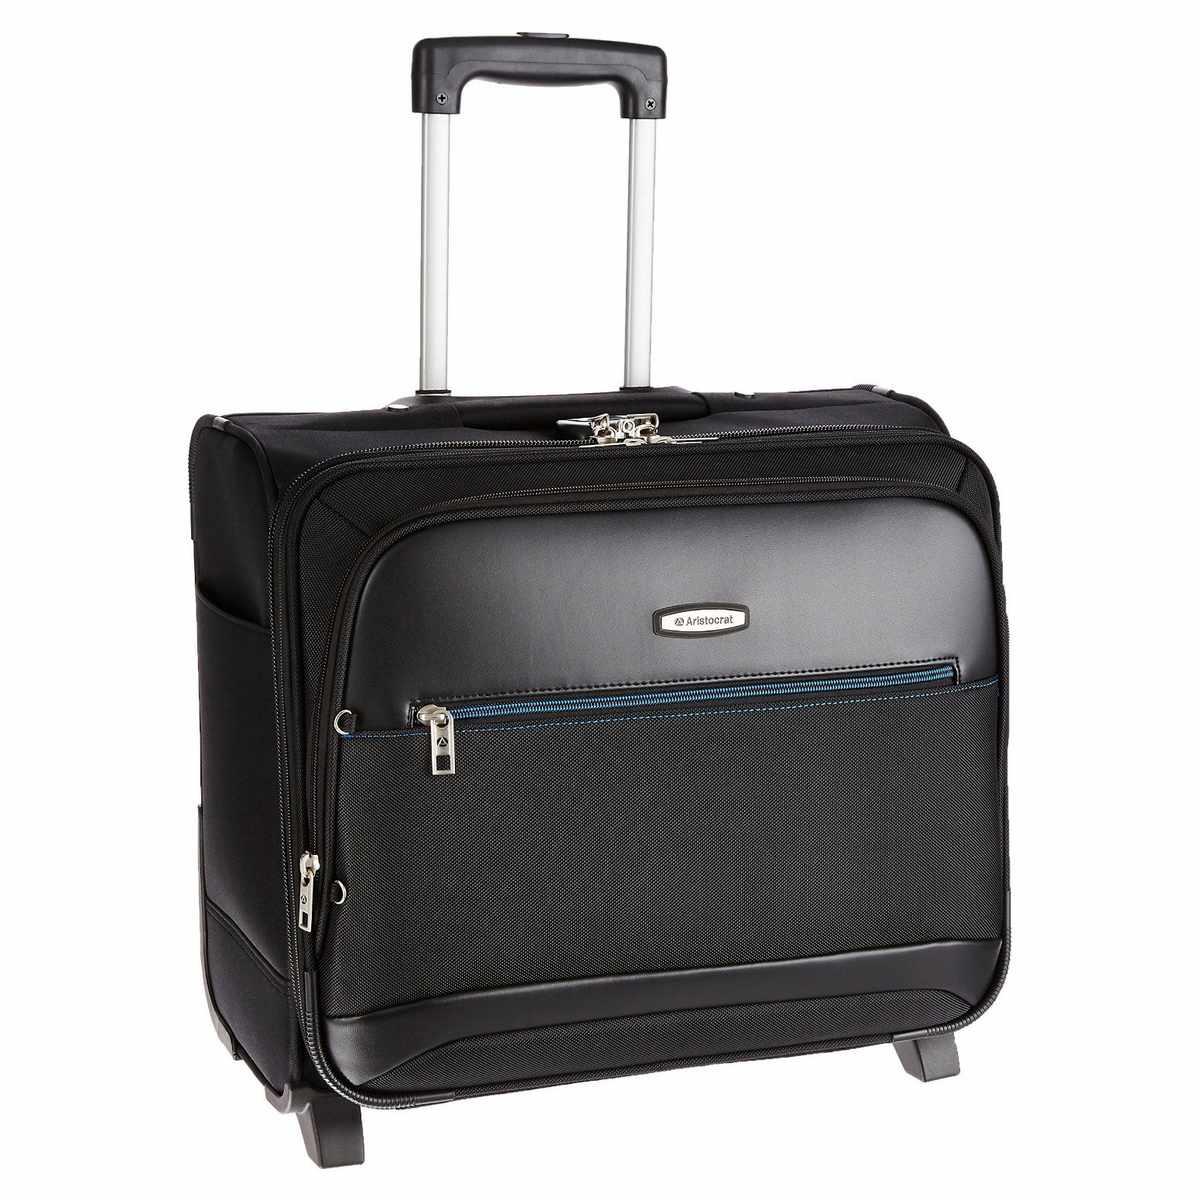 Aristocrat Concorde Laptop Trolley Satchel Bag - Sunrise Trading Co ... 45ee4e9940b53